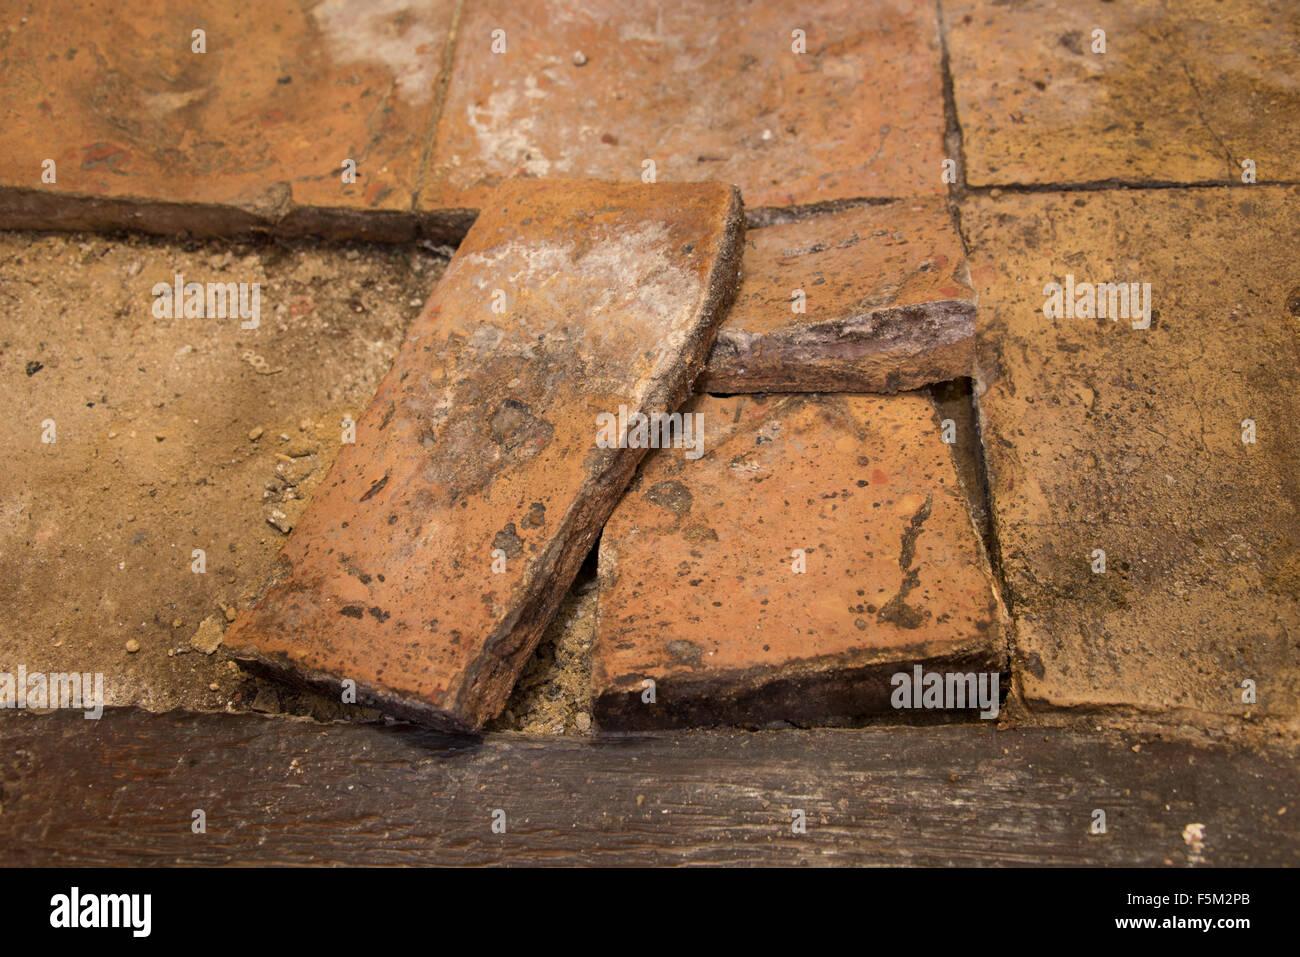 Clay floor tile columbialabelsfo broken clay floor tile stock photo 89566355 alamy dailygadgetfo Image collections